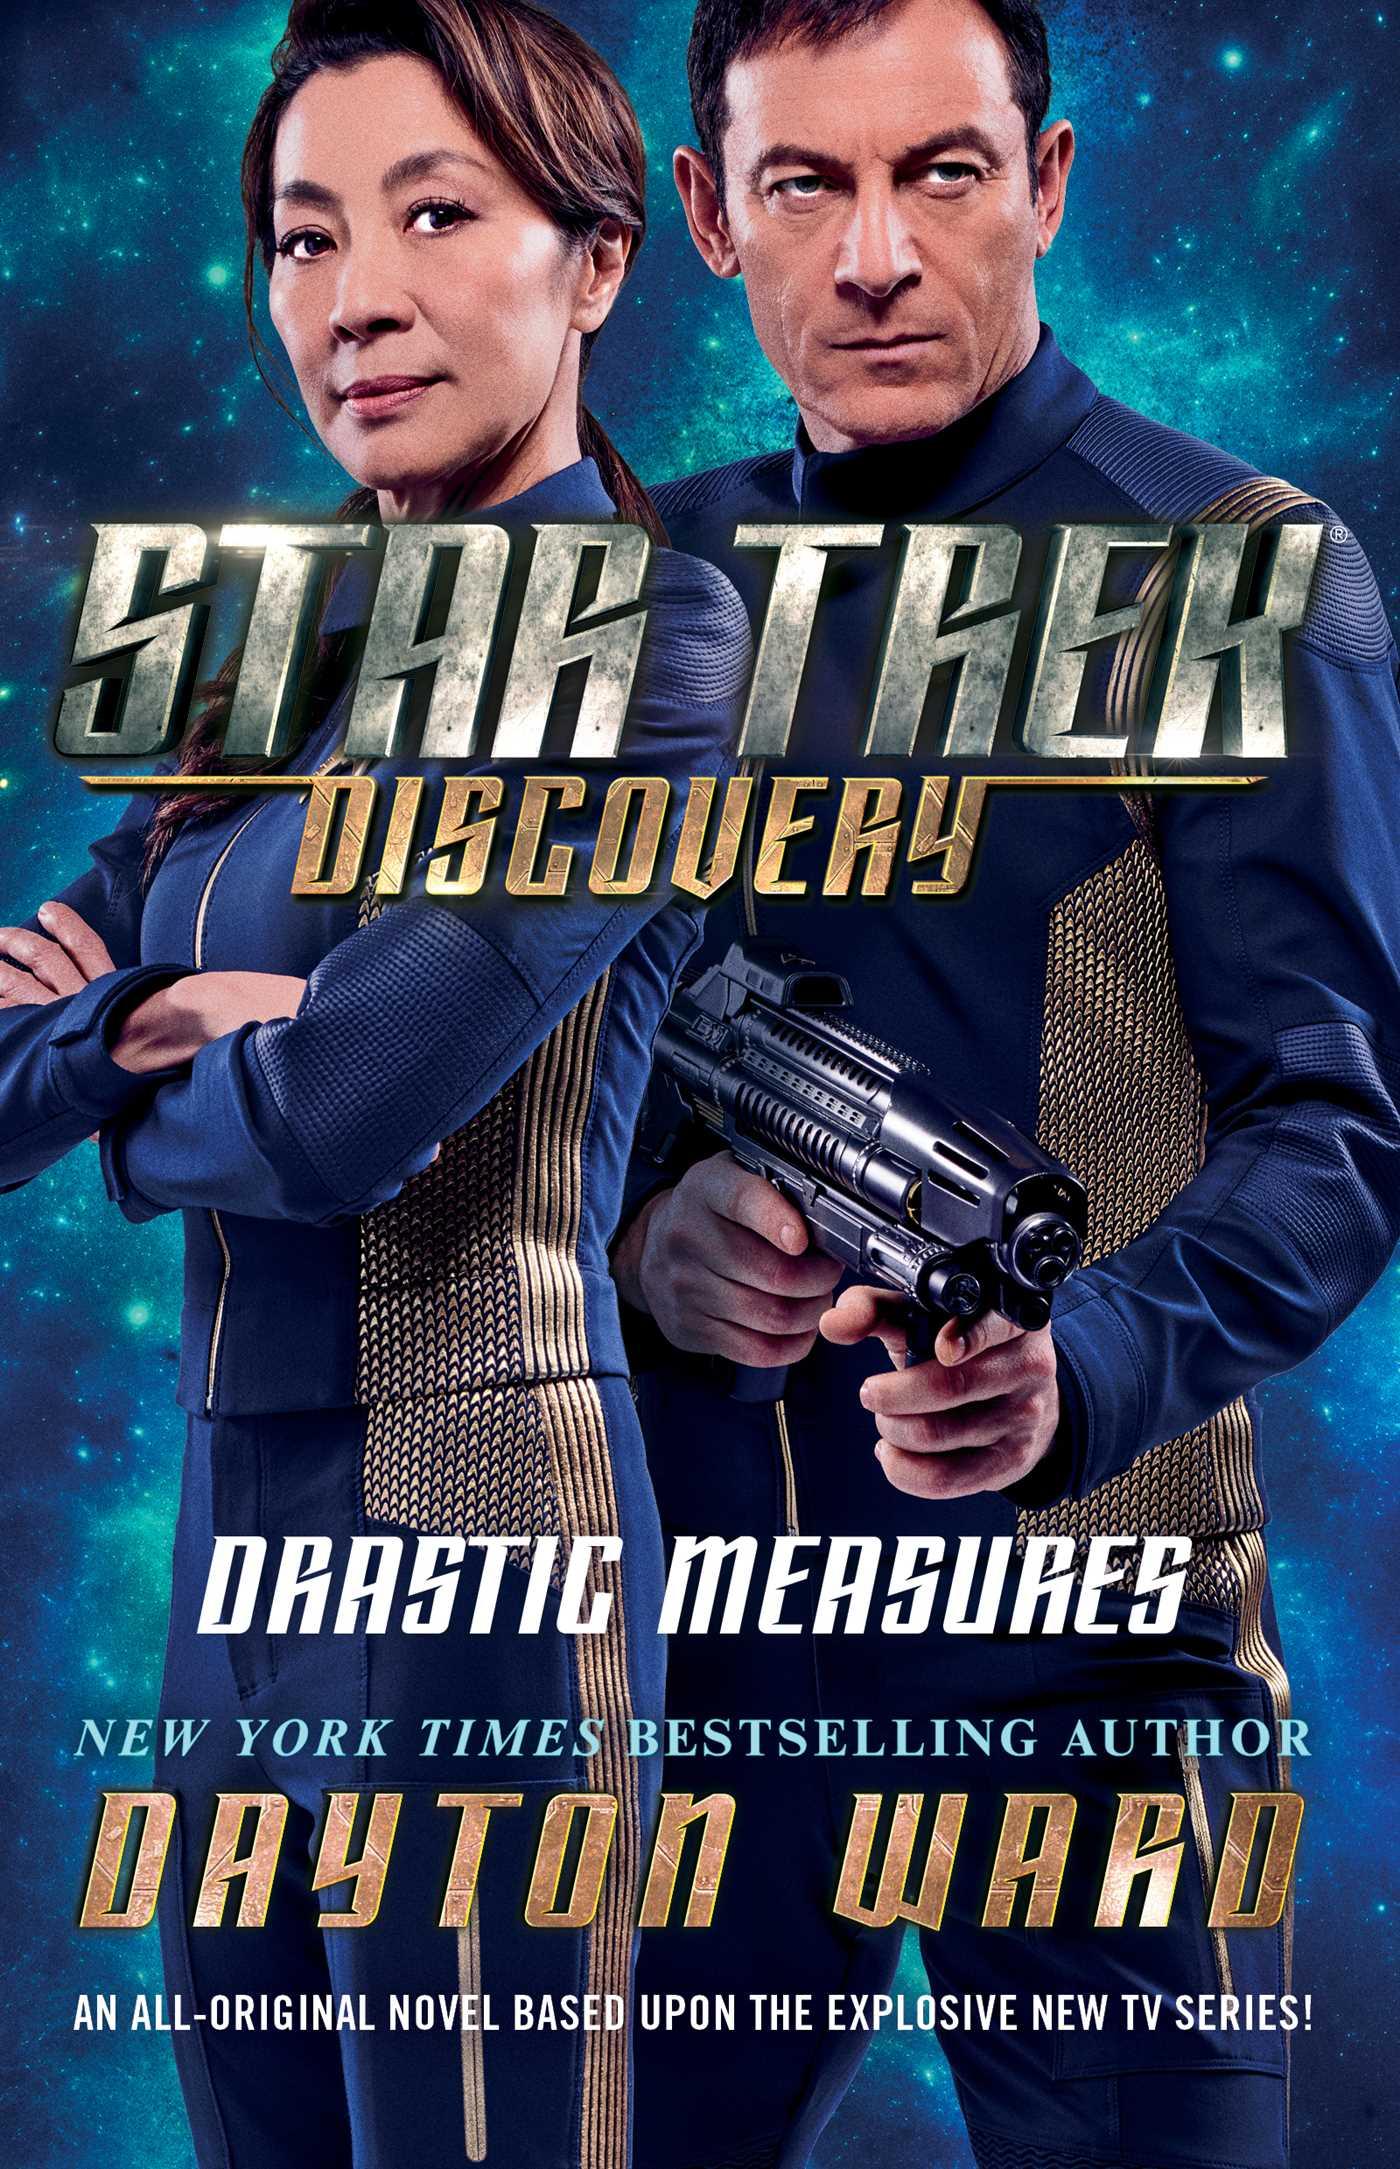 Star trek discovery drastic measures 9781501171758 hr